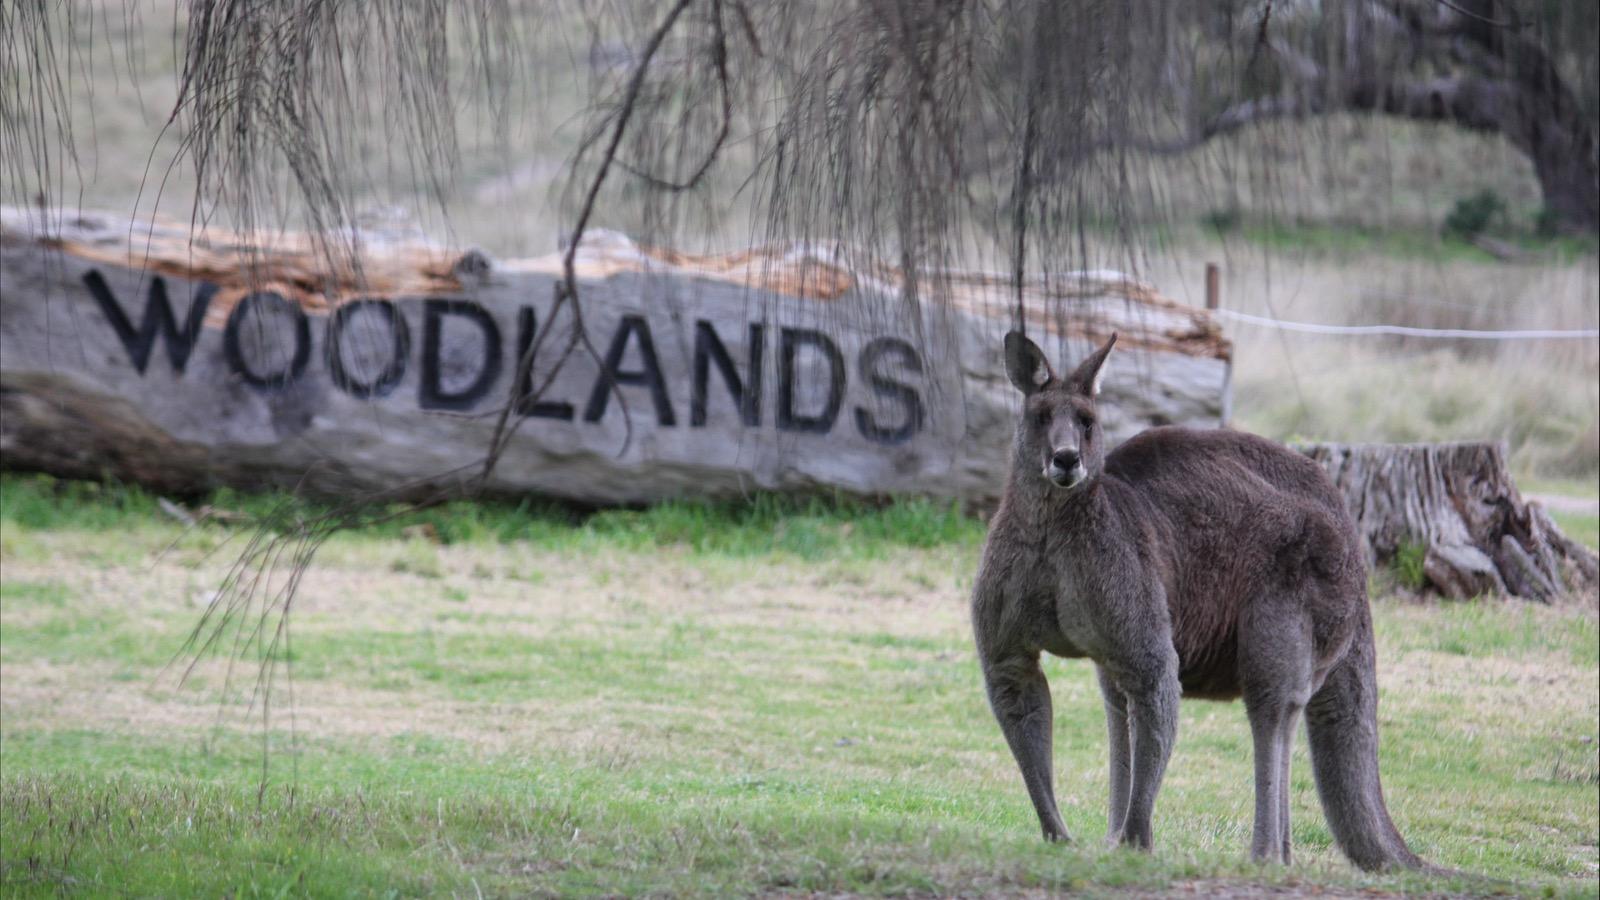 Kangaroo at Living Legends - Woodlands